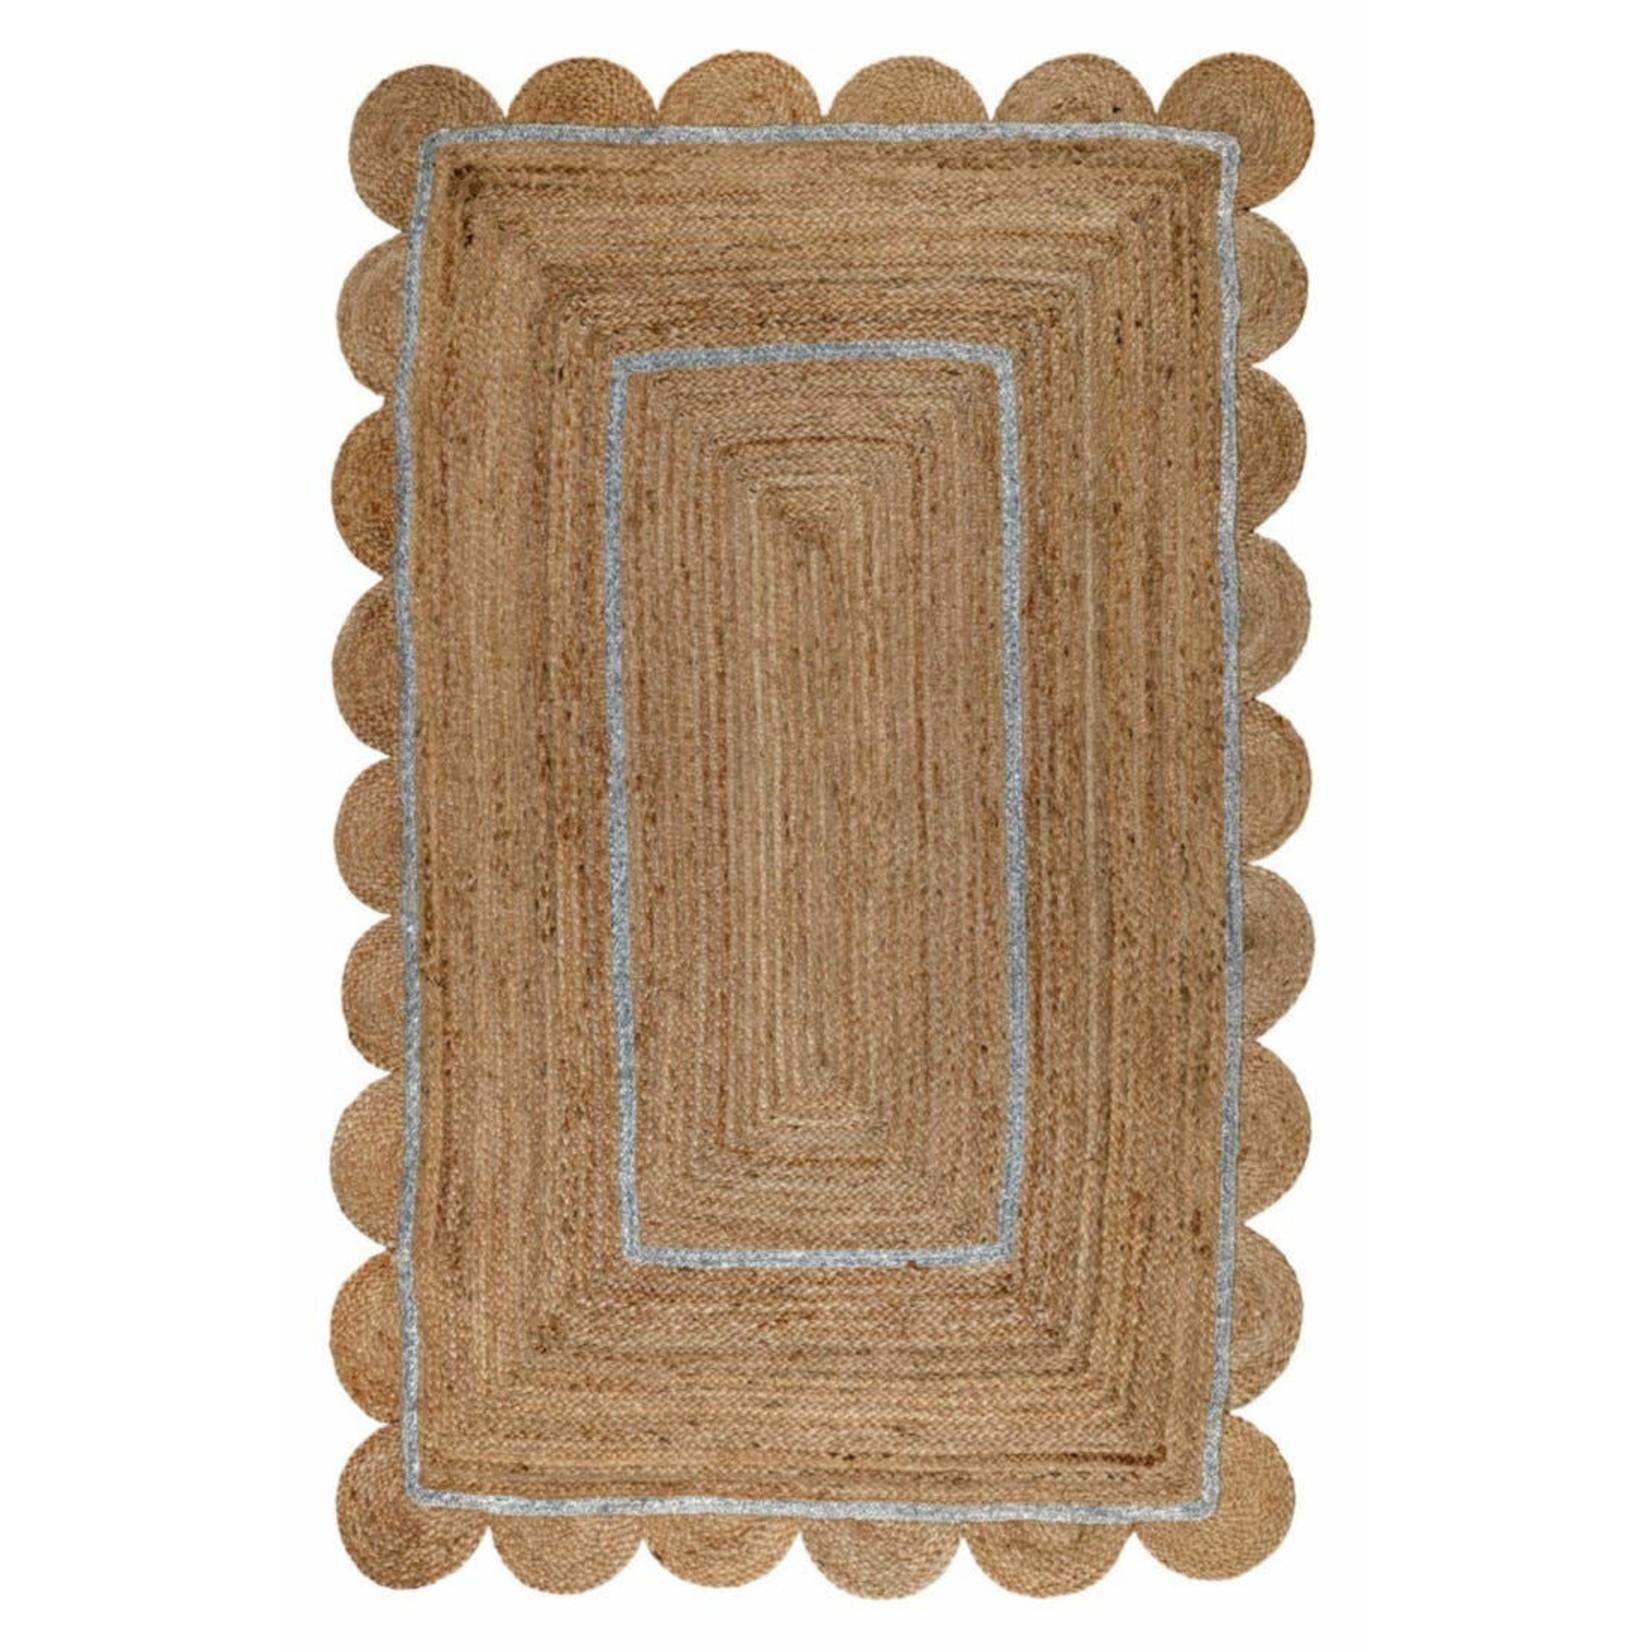 Sohana Scalloped Jute Rugs (3' x 5')